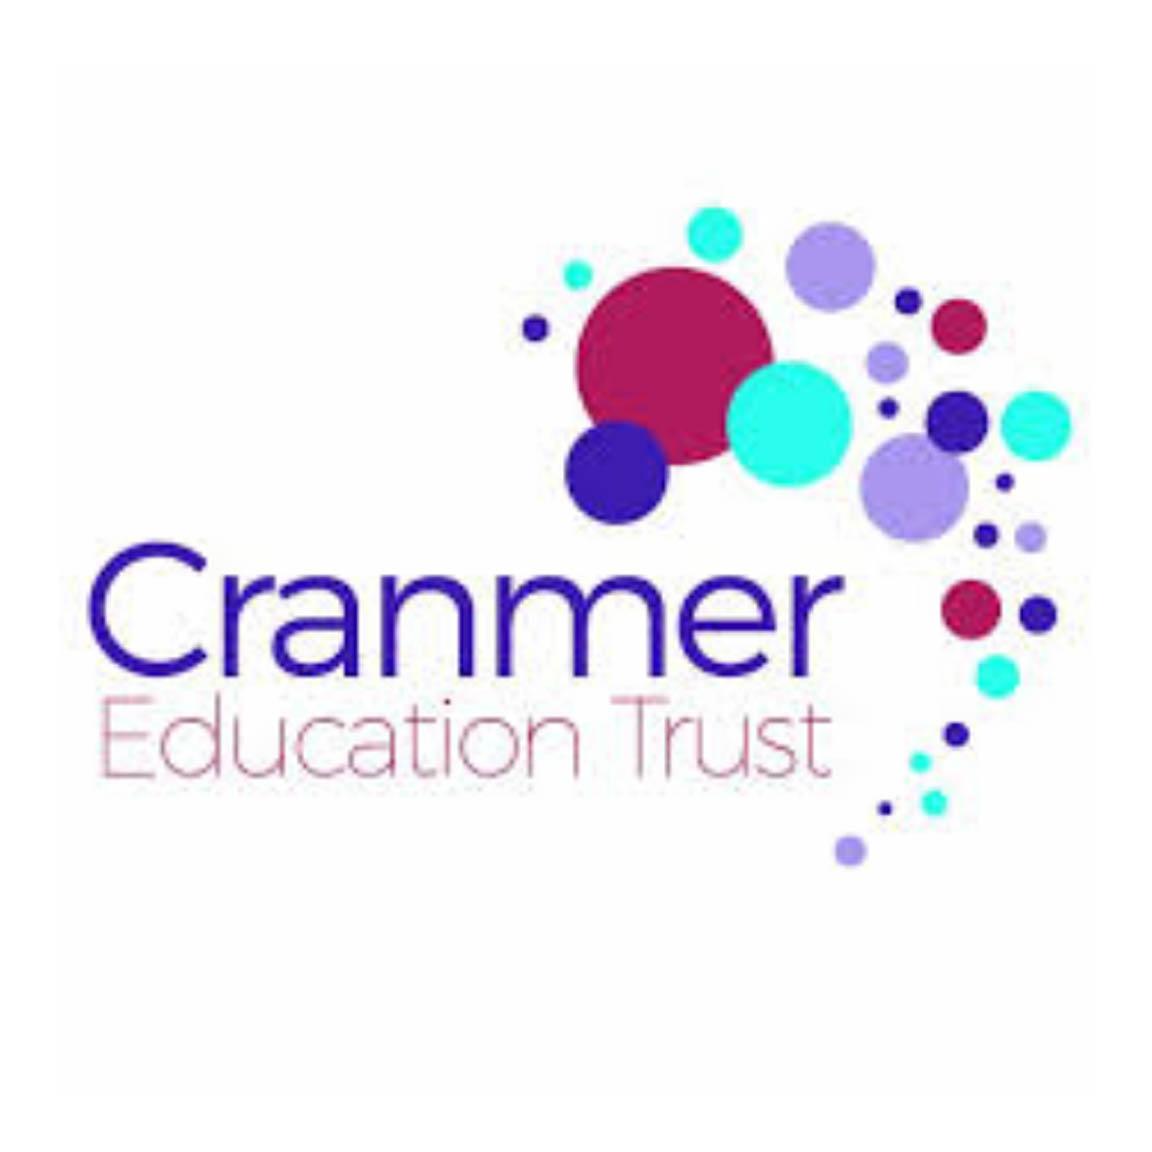 Cranmer Education Trust